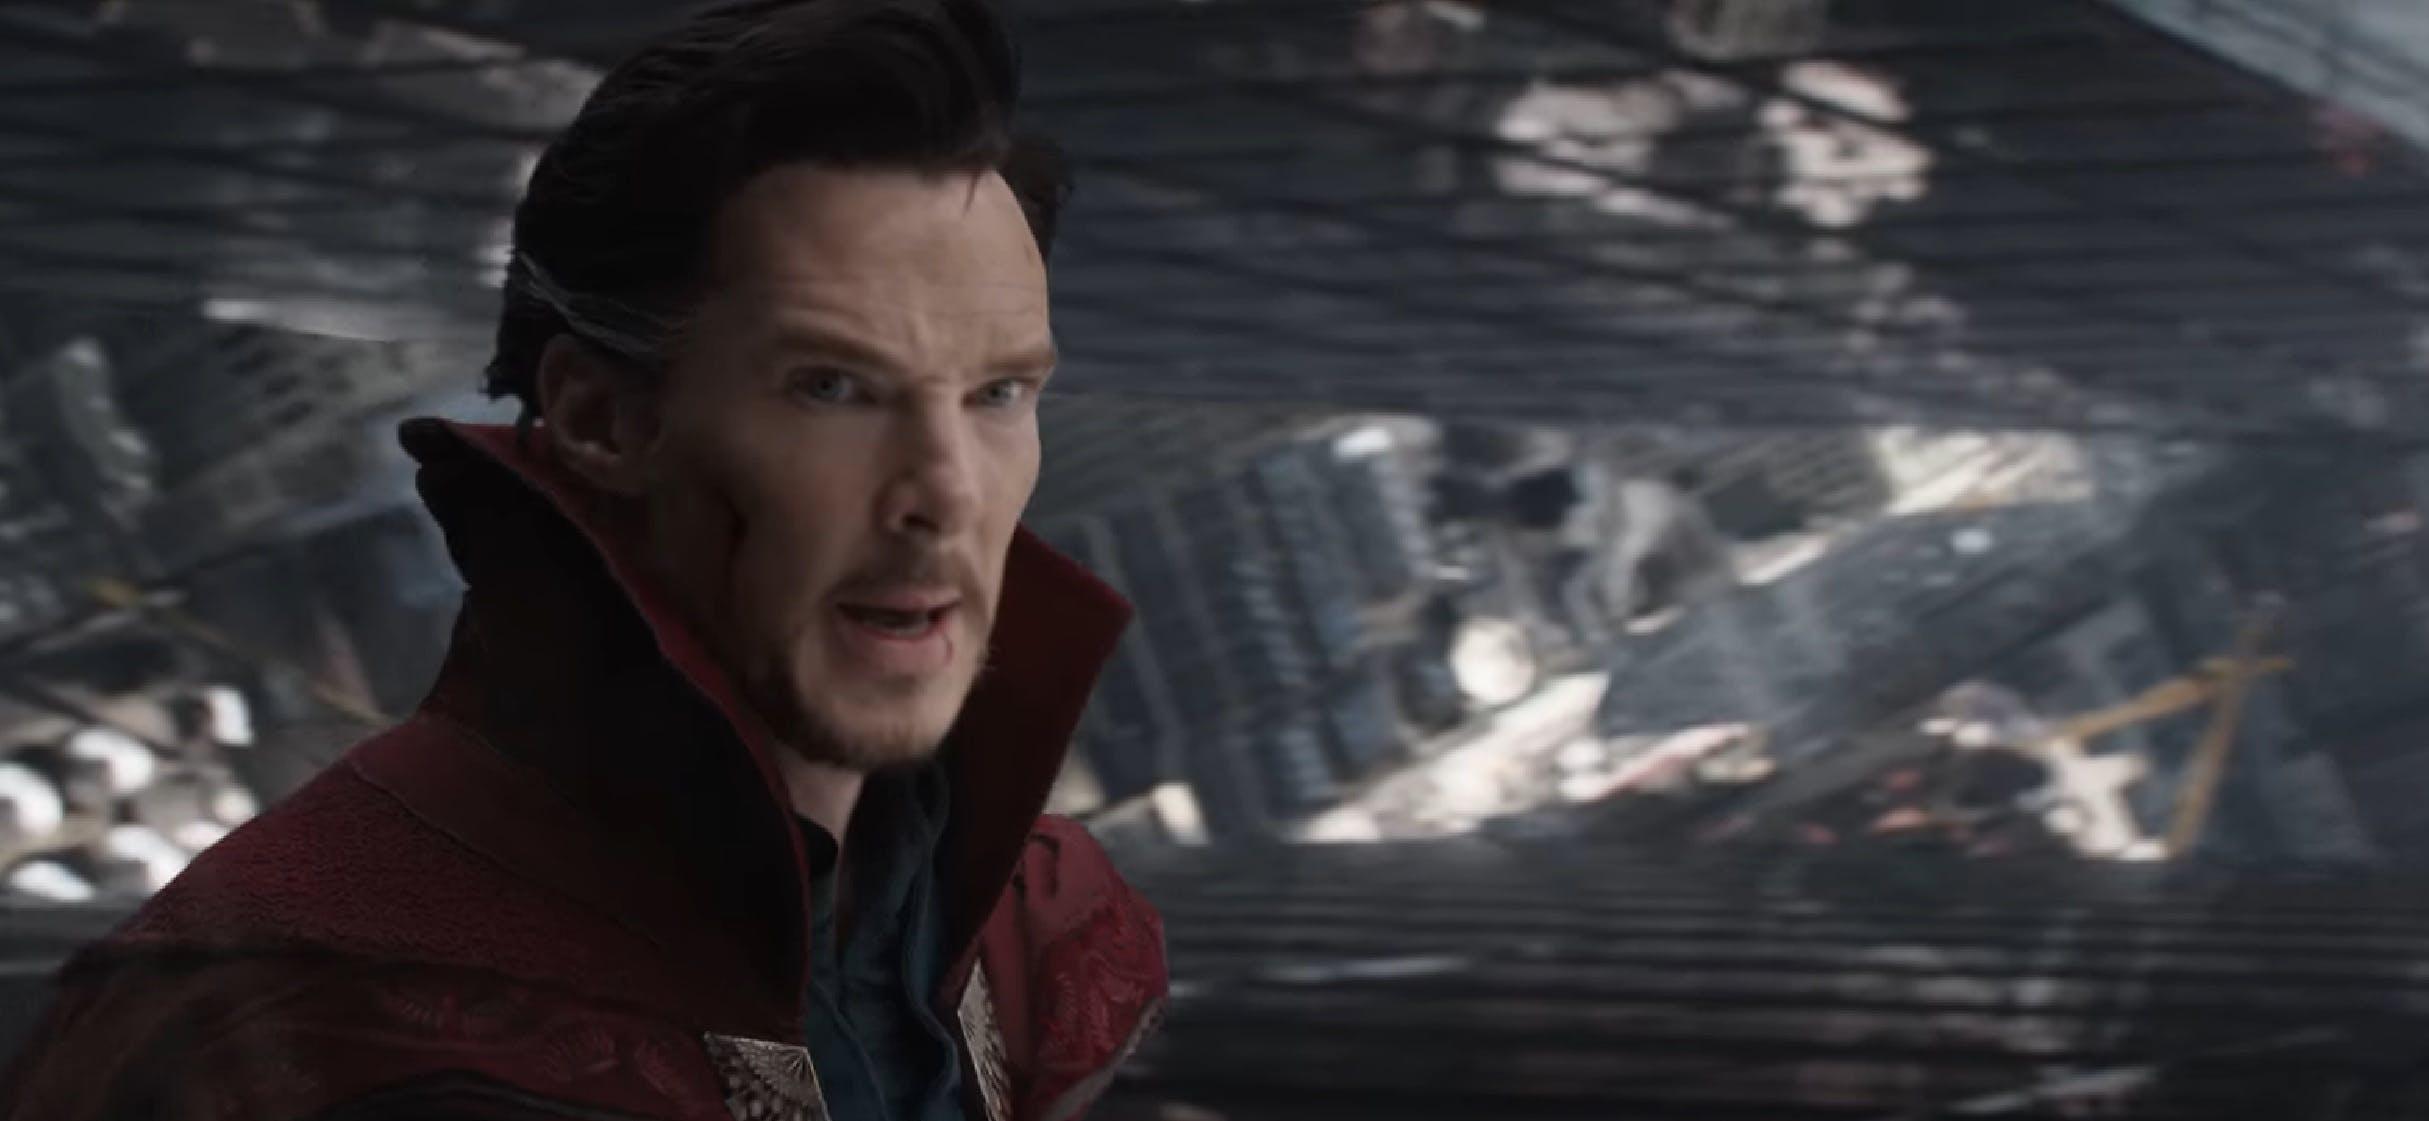 avengers endgame theories doctor strange time loop